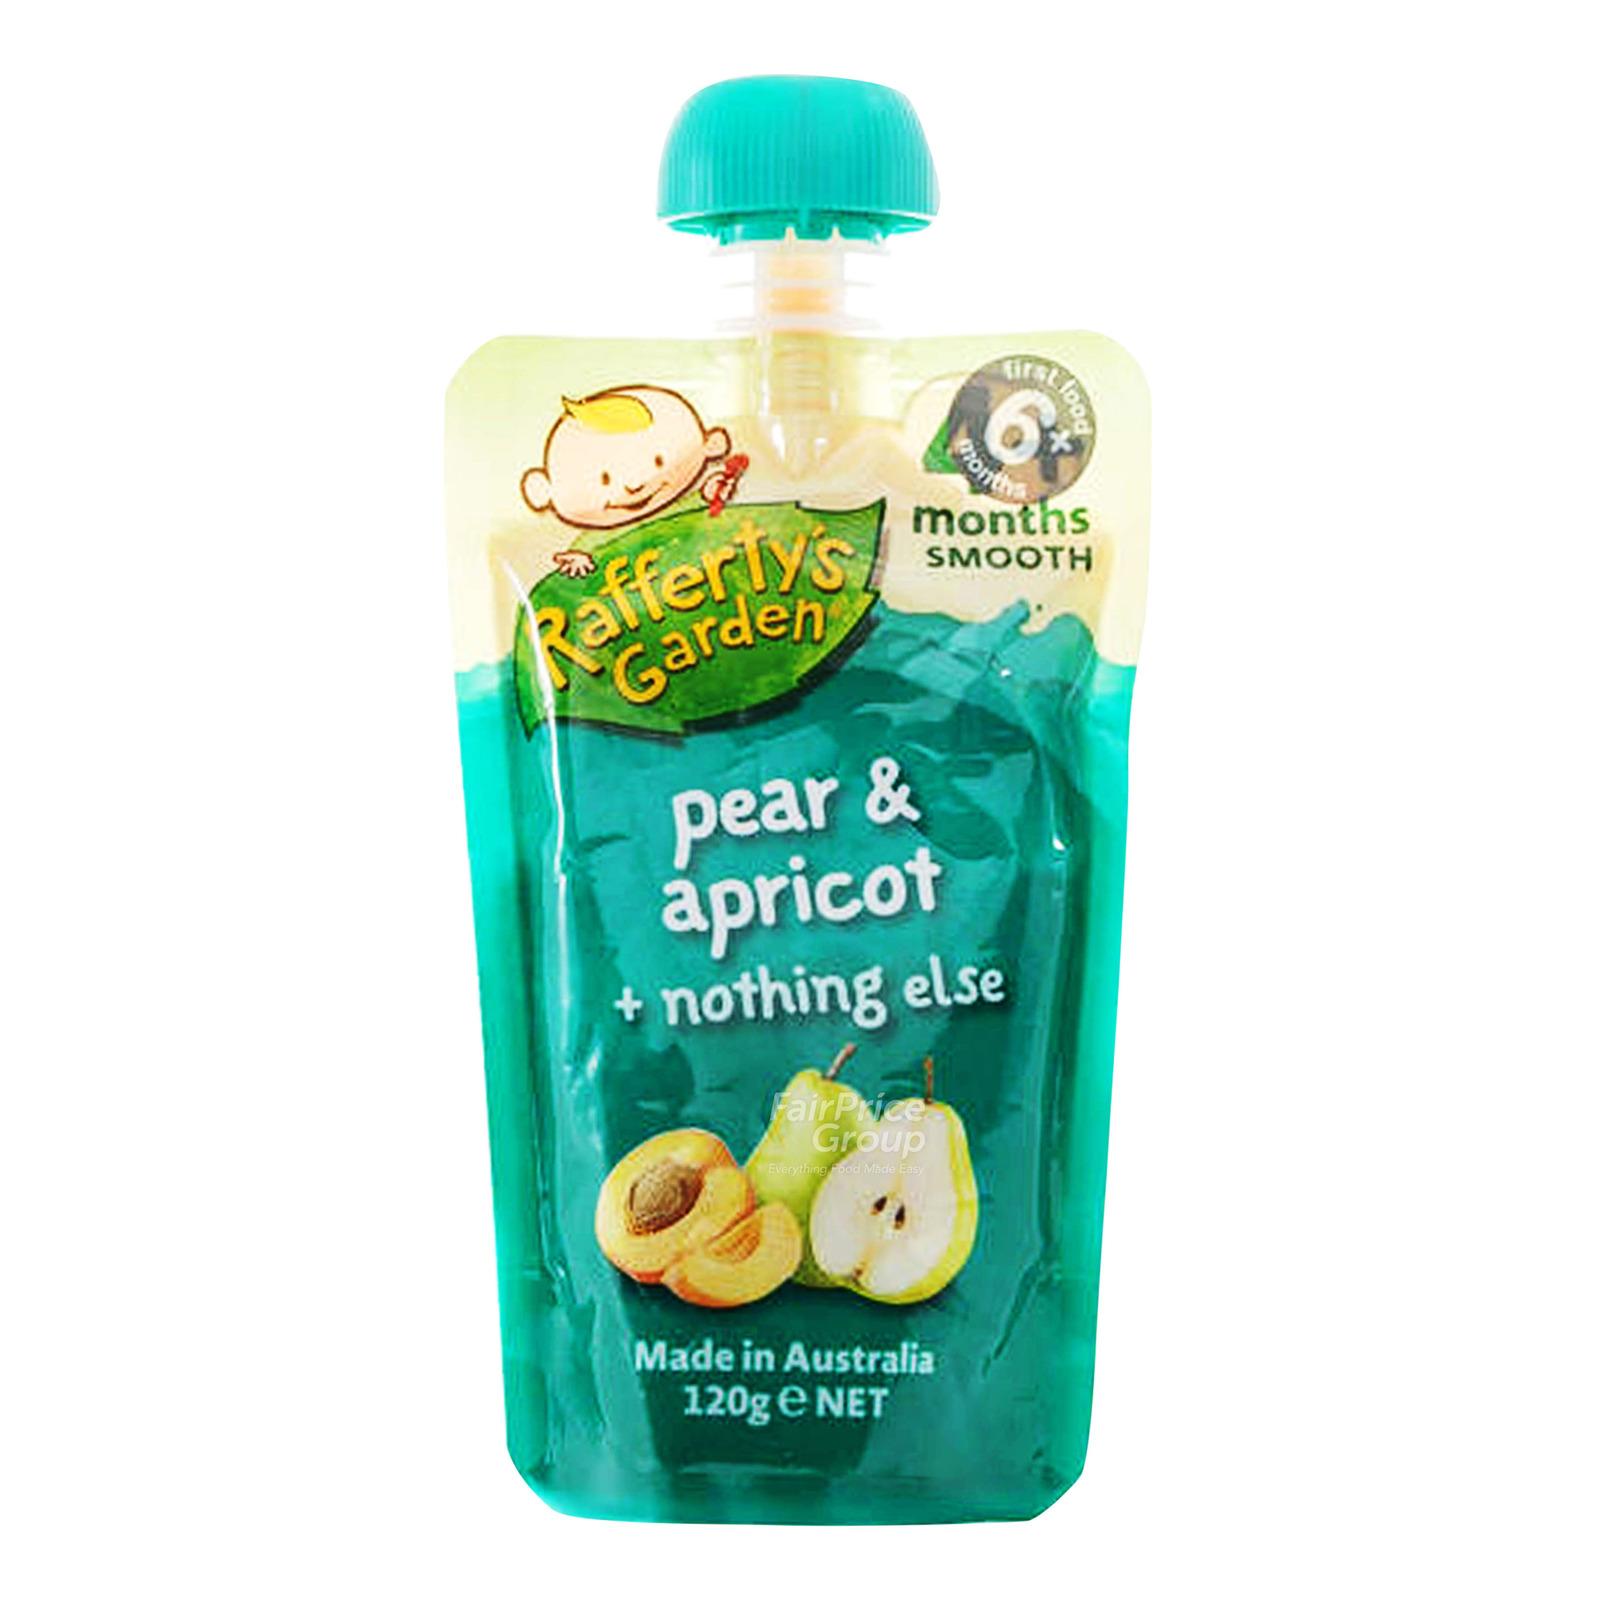 Rafferty's Garden Baby Food - Pear & Apricot